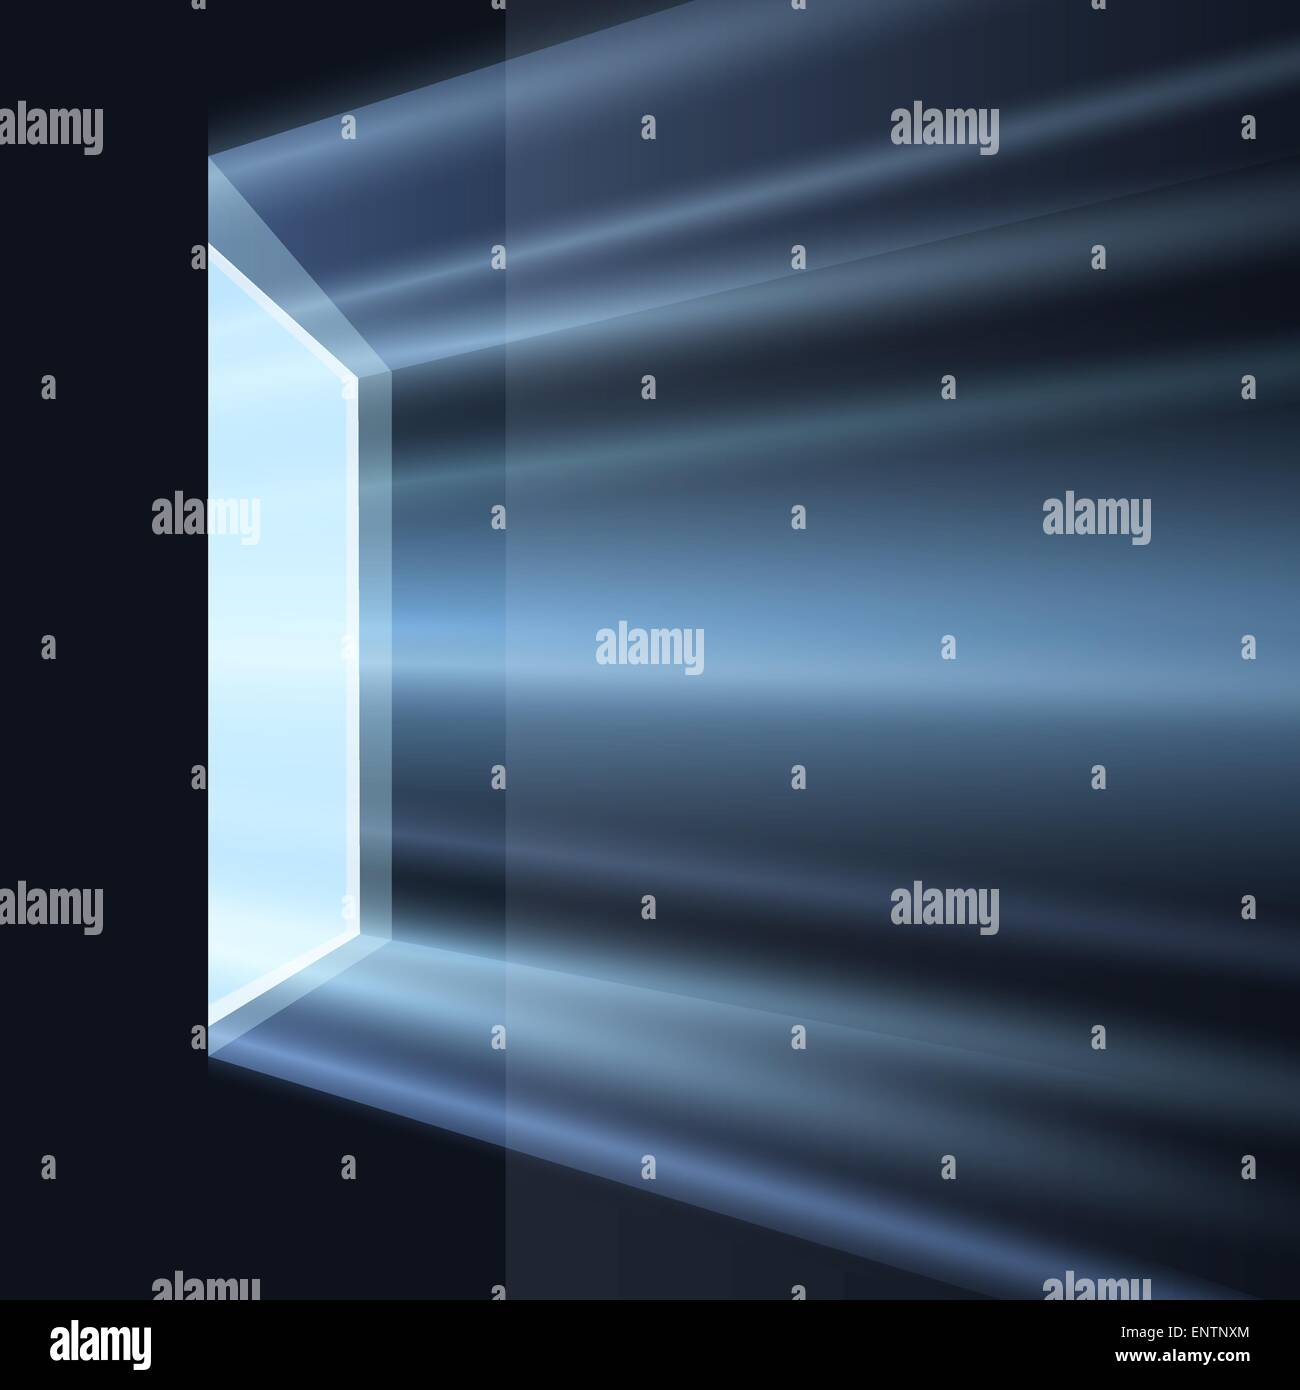 Dark room with light through window - Ray Of Light Through The Window In Dark Room